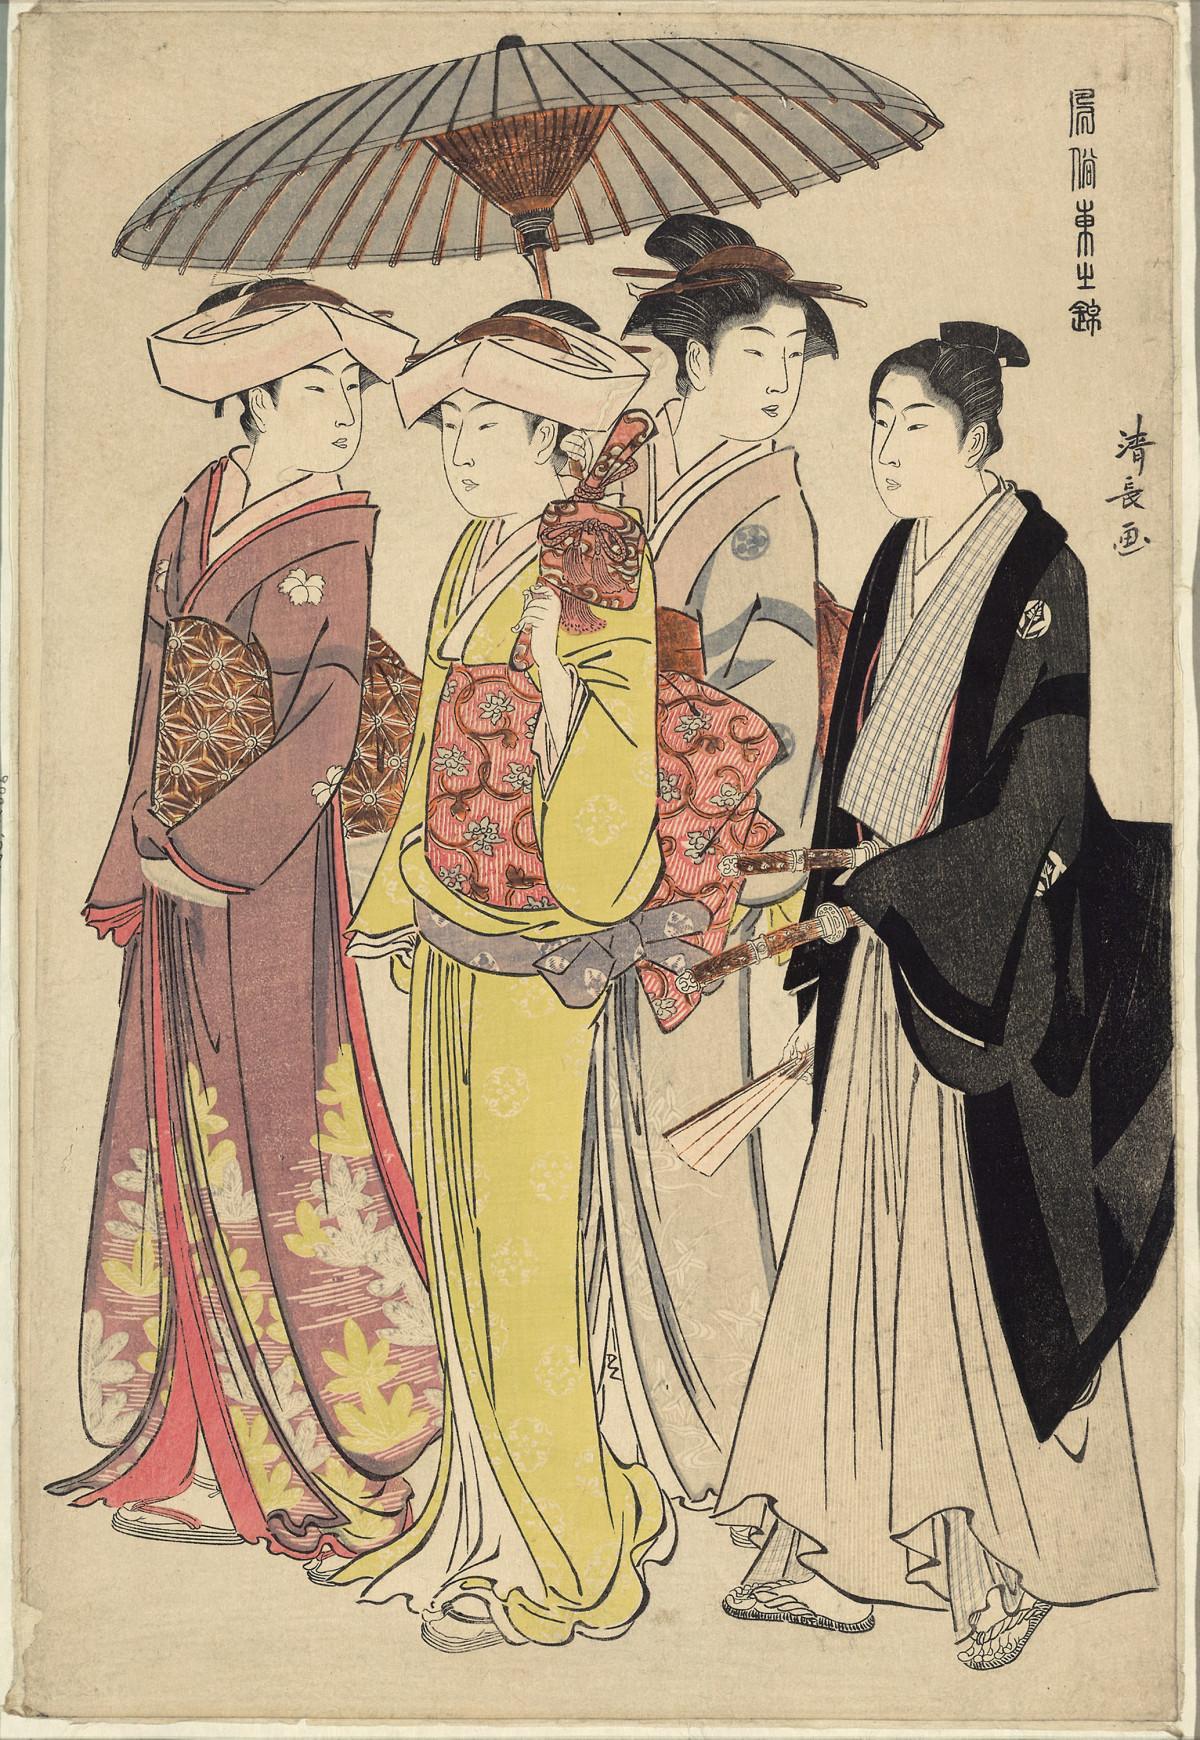 Free Images : woman, art, costume design, illustration ...